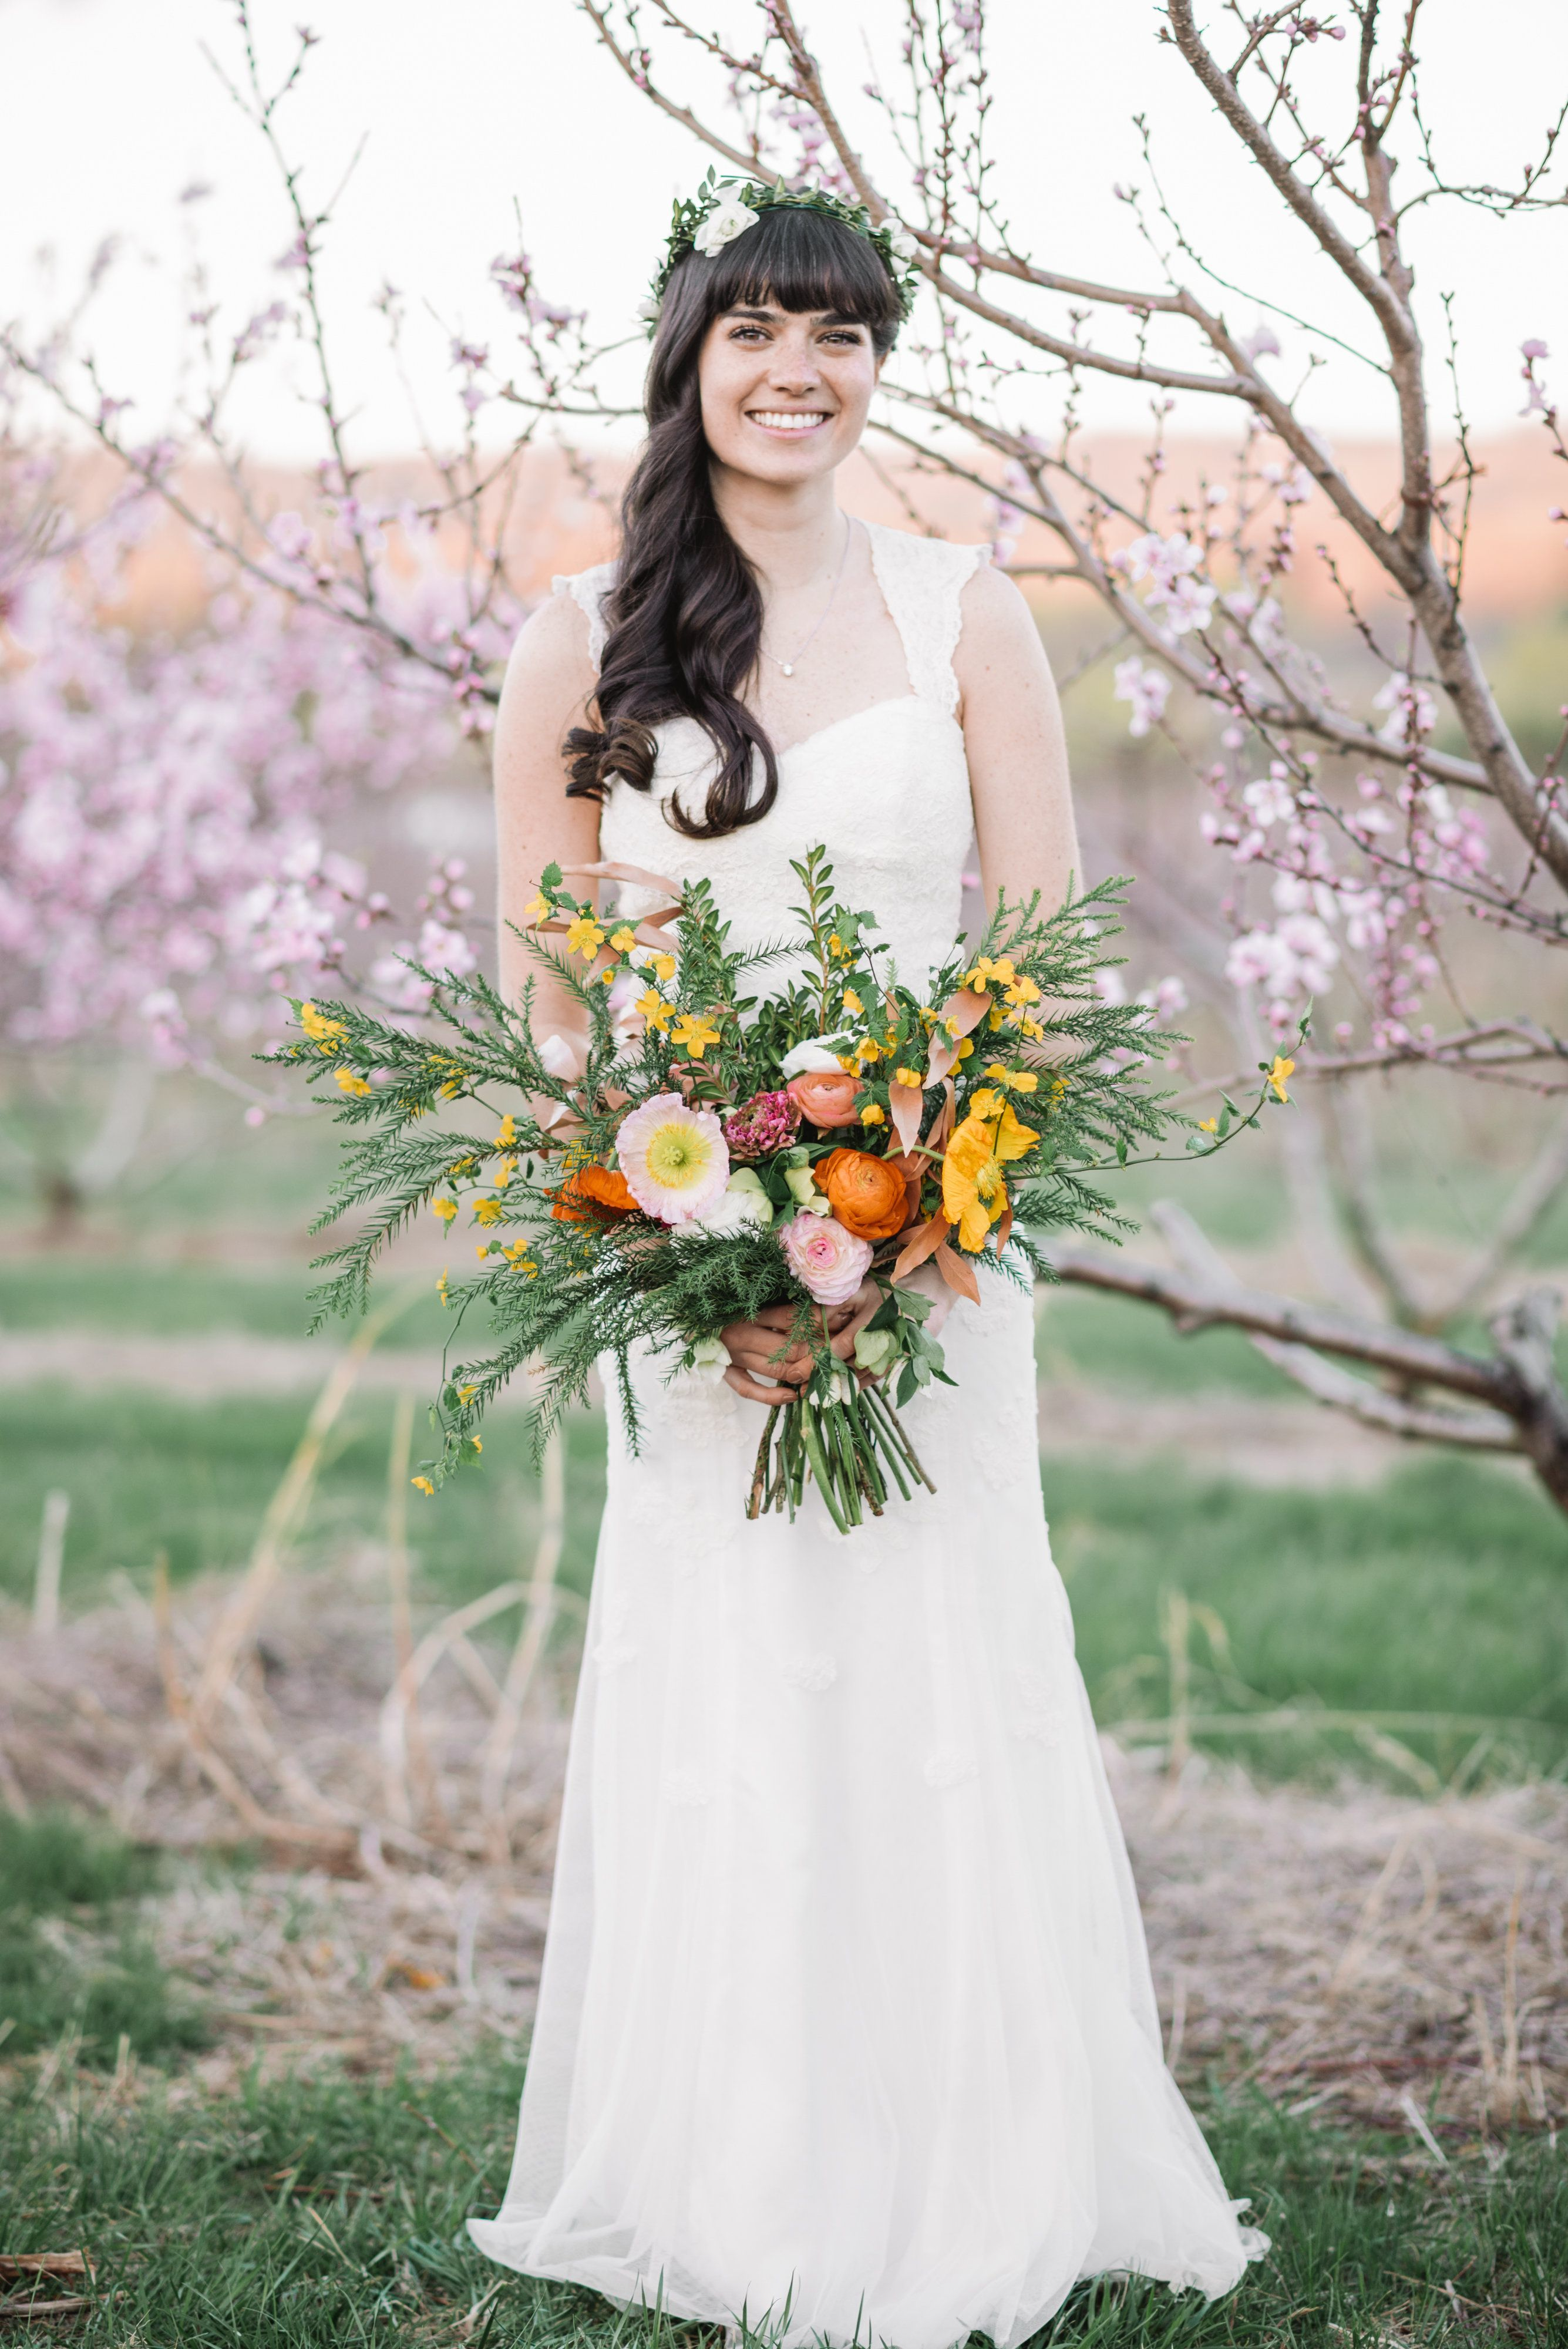 Whimsical outdoor wedding bridal poses bridal portraits and weddings